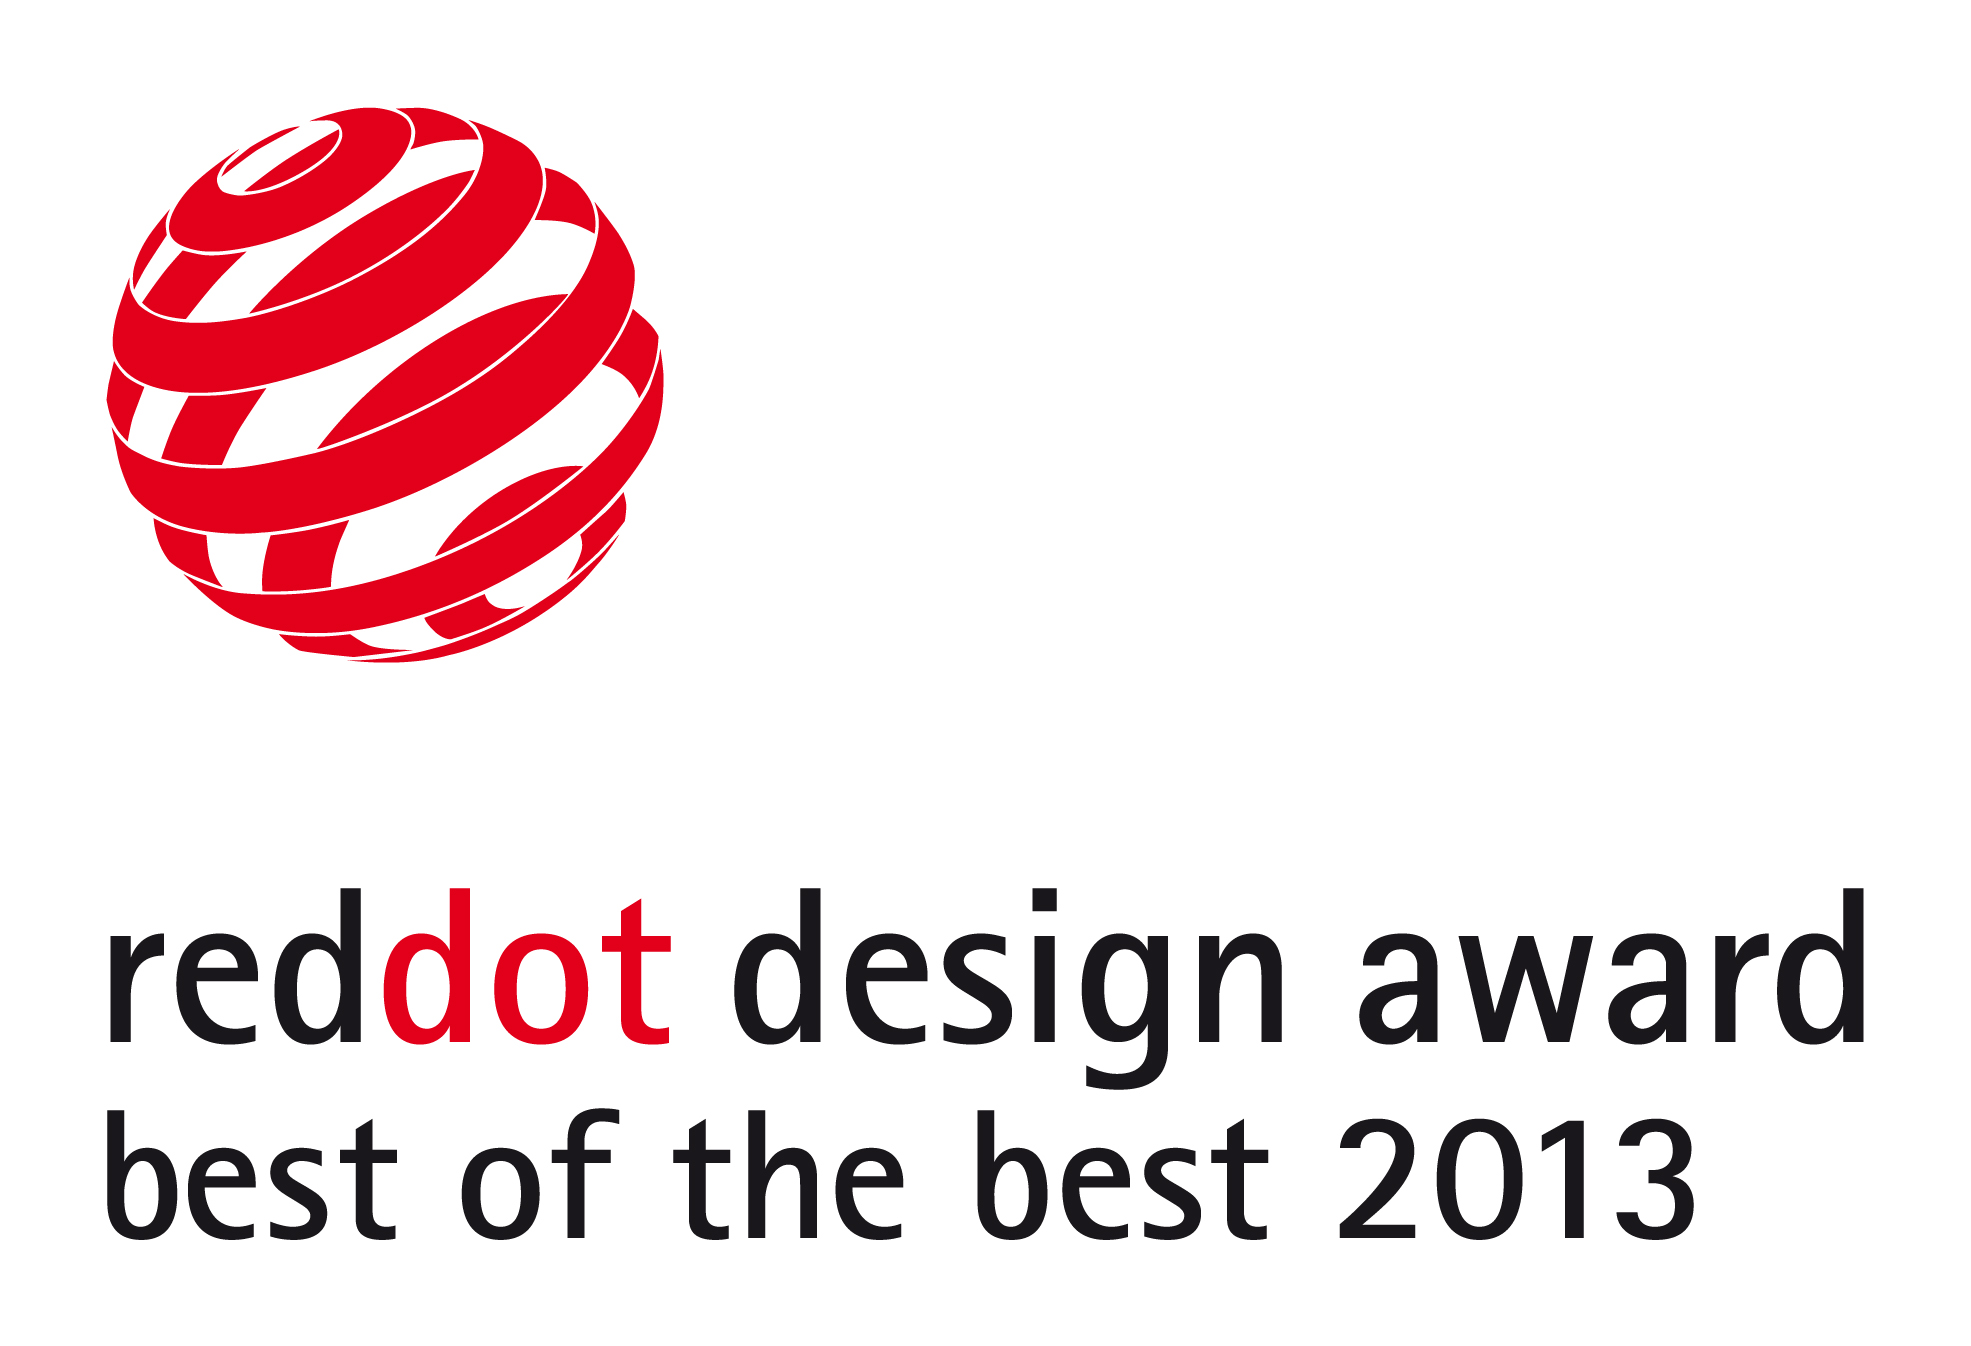 rdda_best of the best 2013_line_rgb